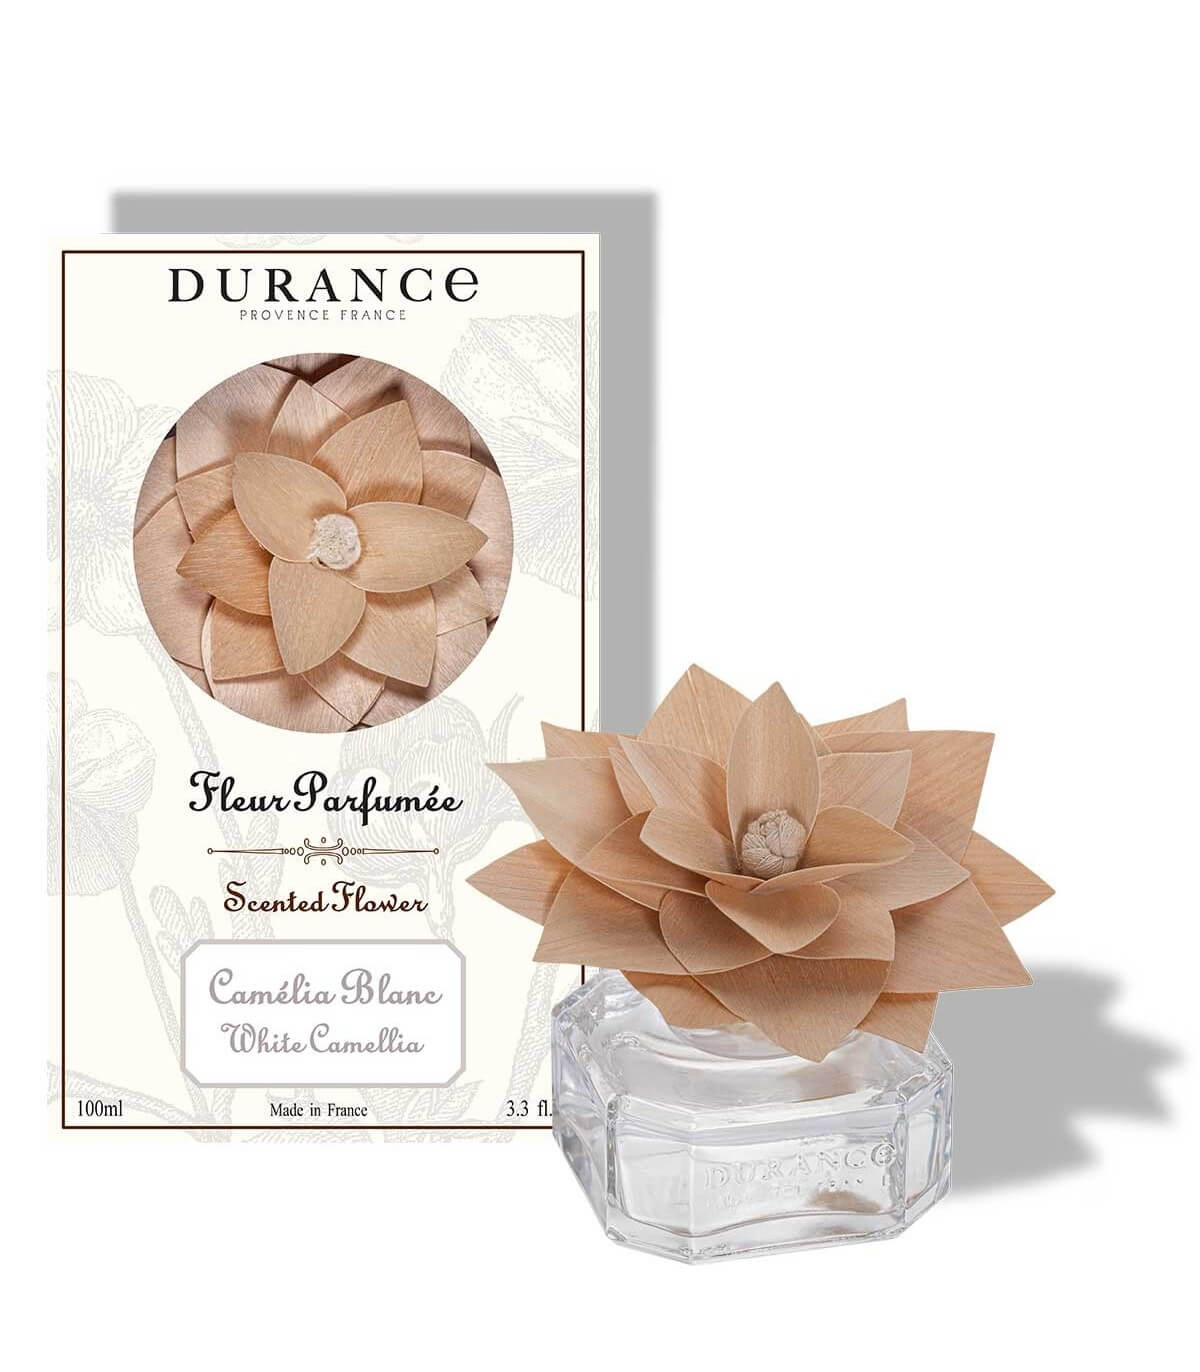 Fleur parfumée camélia blanc